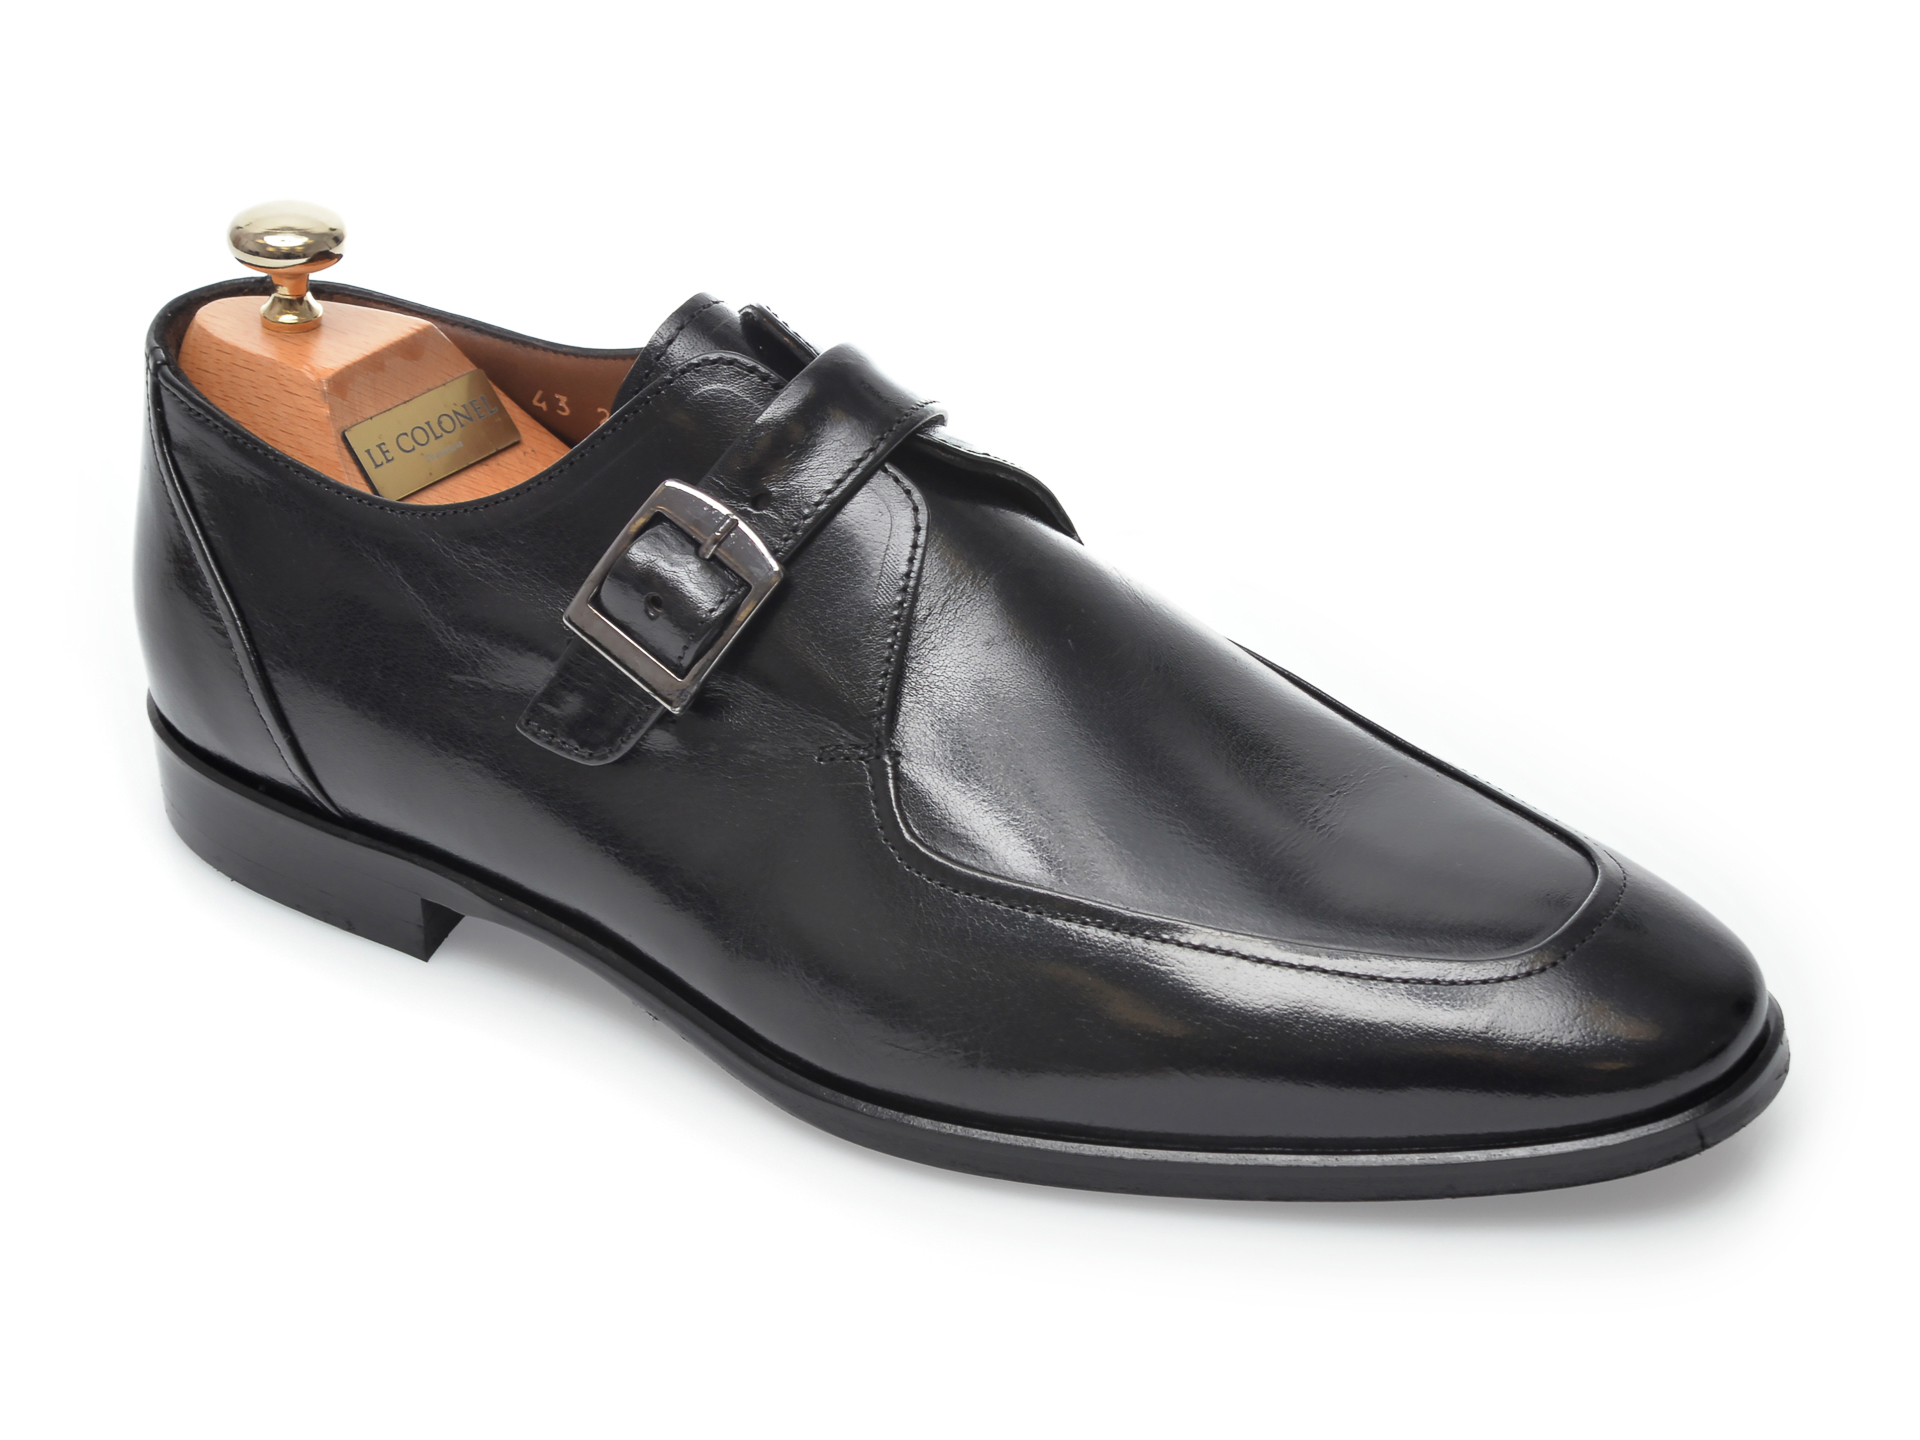 Pantofi LE COLONEL negri, 47901, din piele naturala imagine